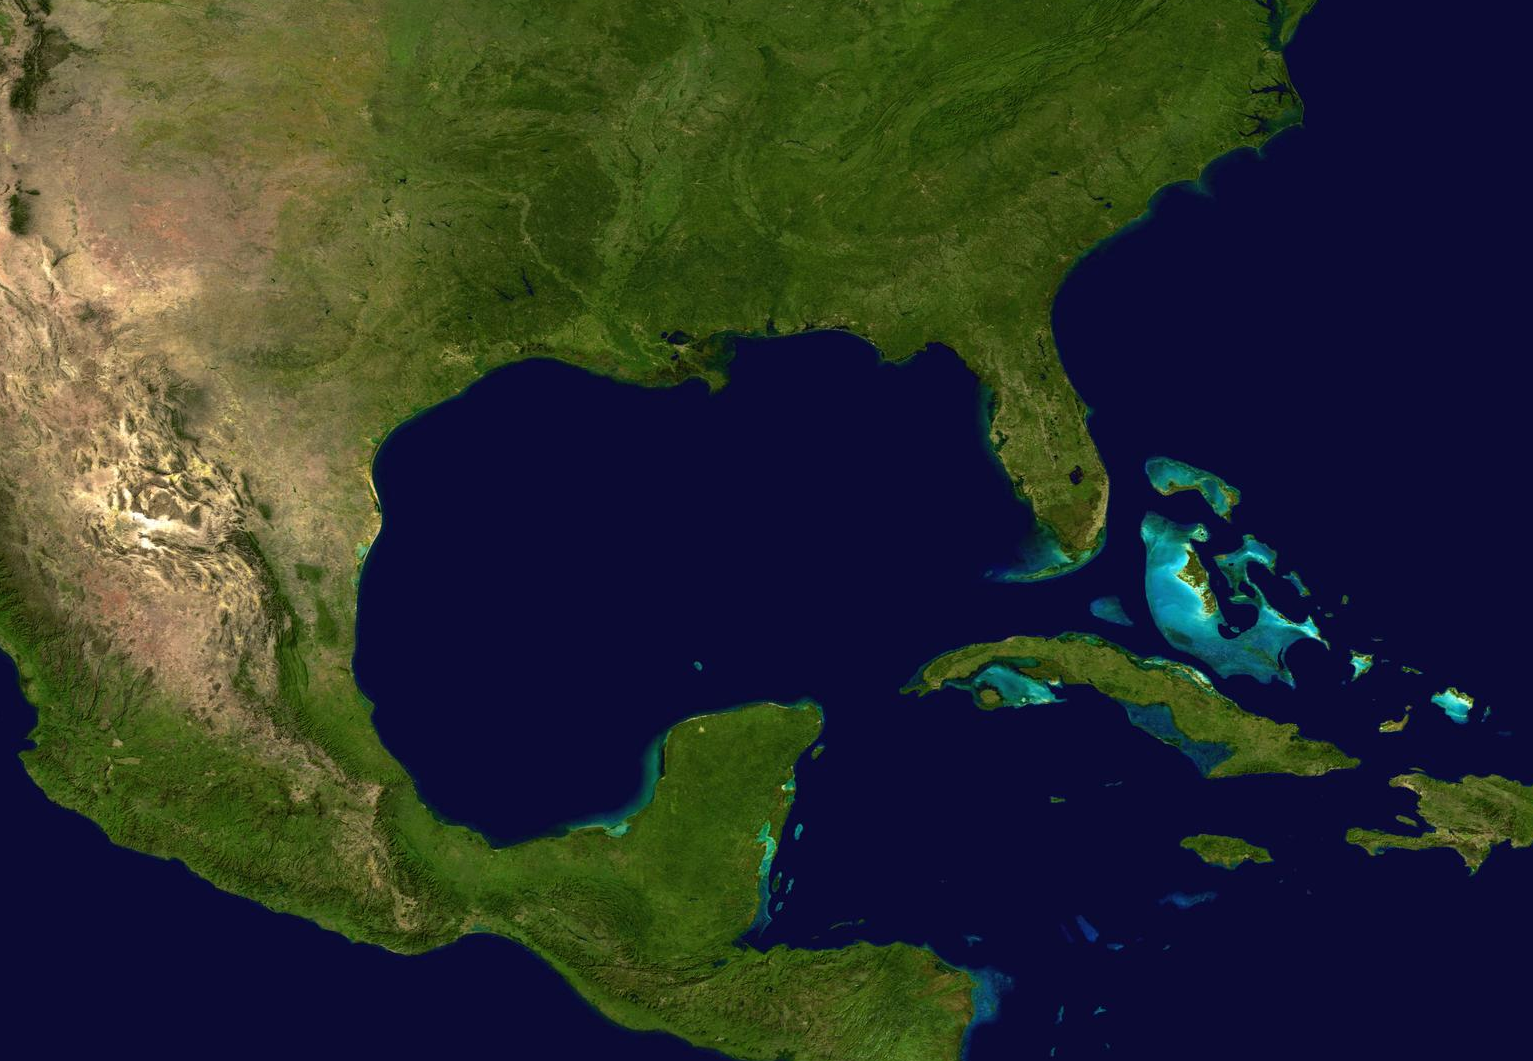 Blue Marble Hurricane Opal Hurricane History Louisiana History